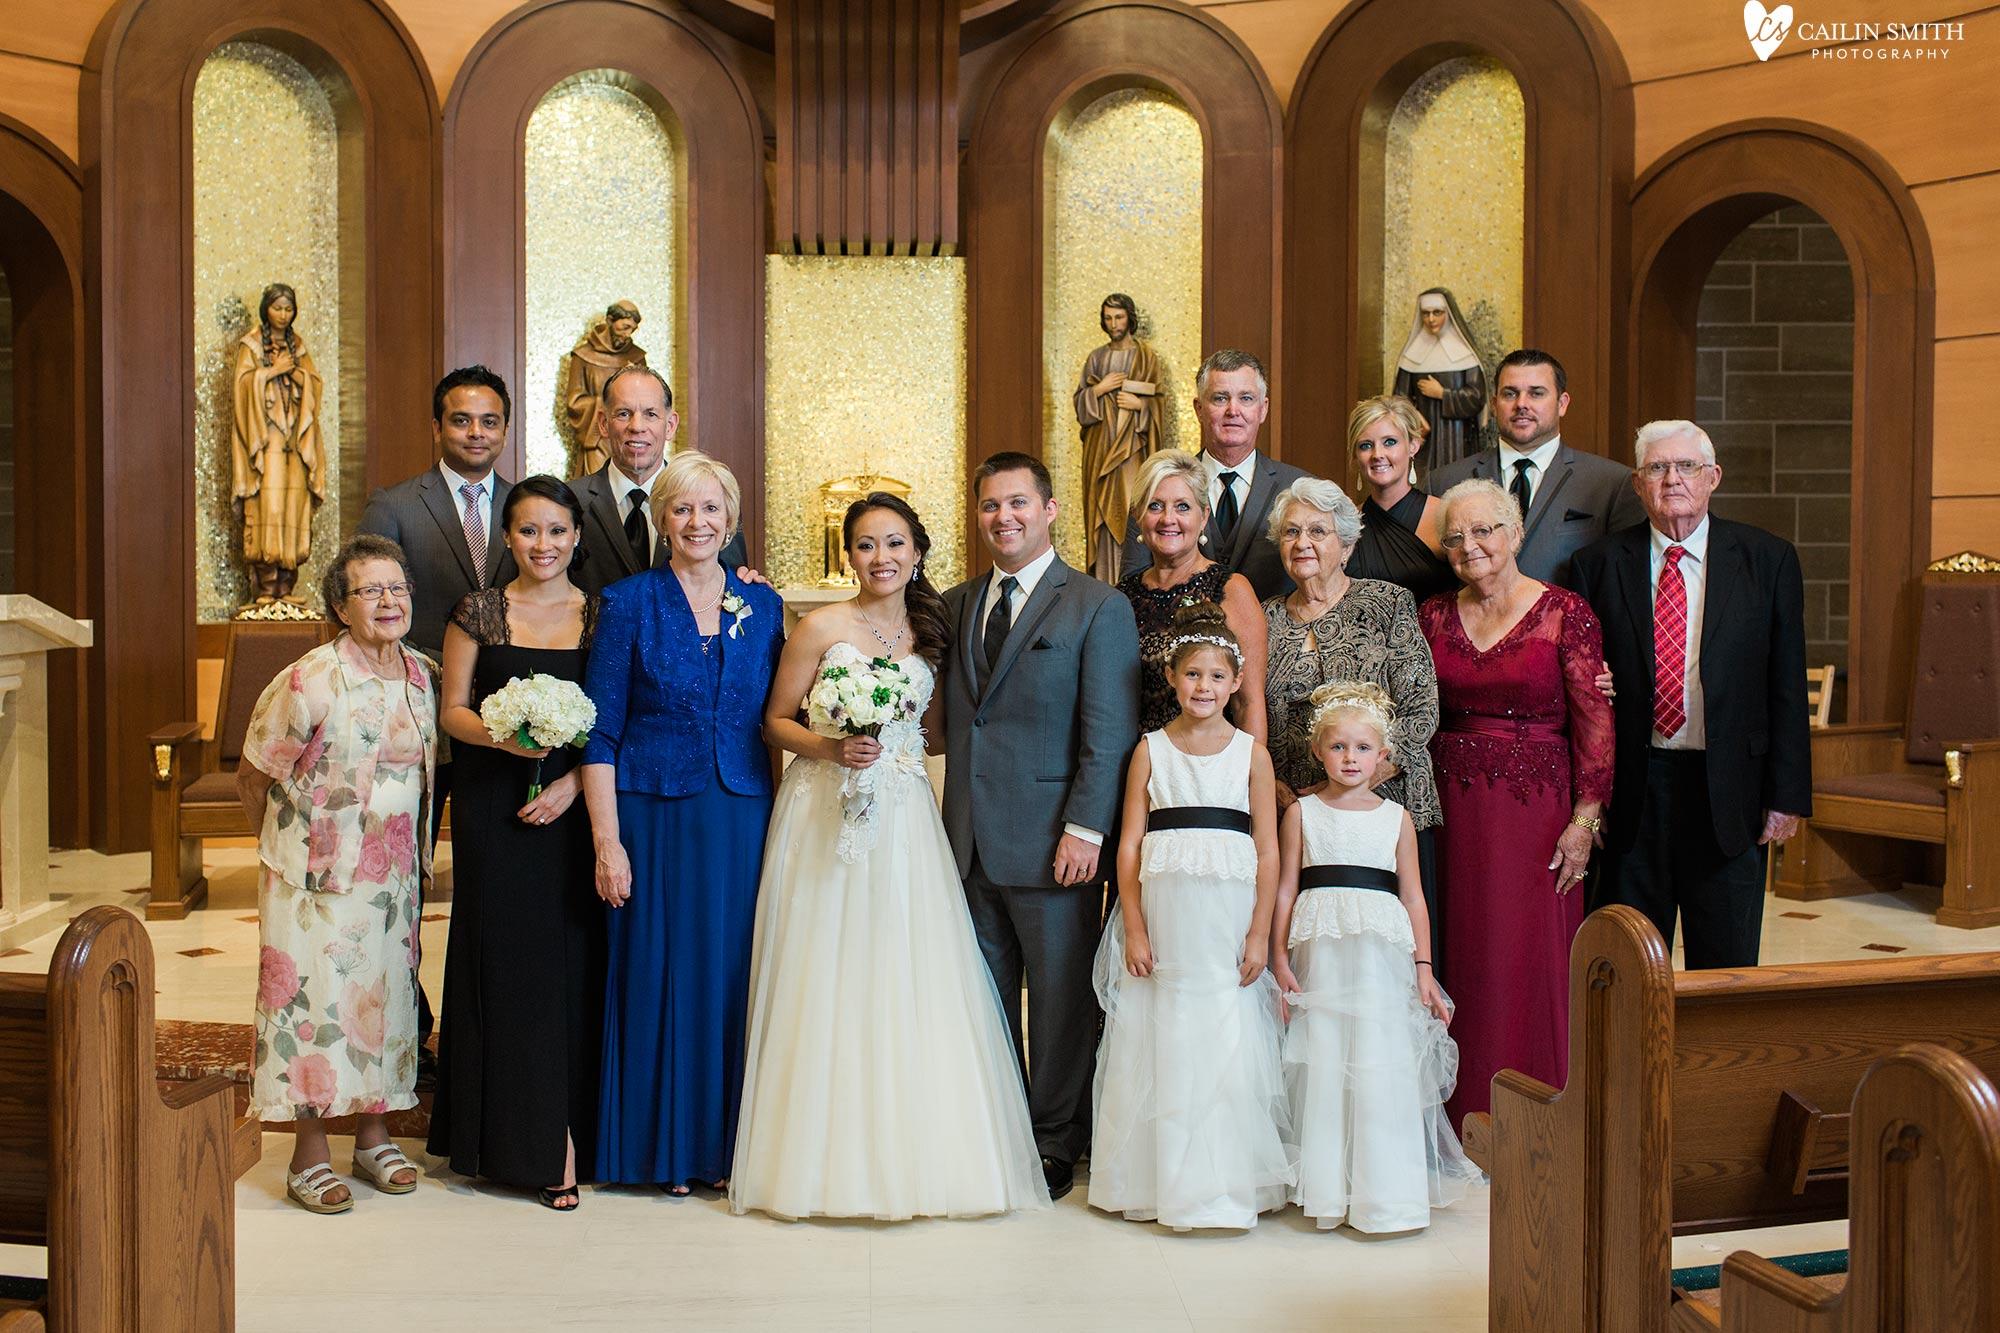 Jenifer_Dewey_Treasury_on_The_Plaza_Wedding_Photography_032.jpg